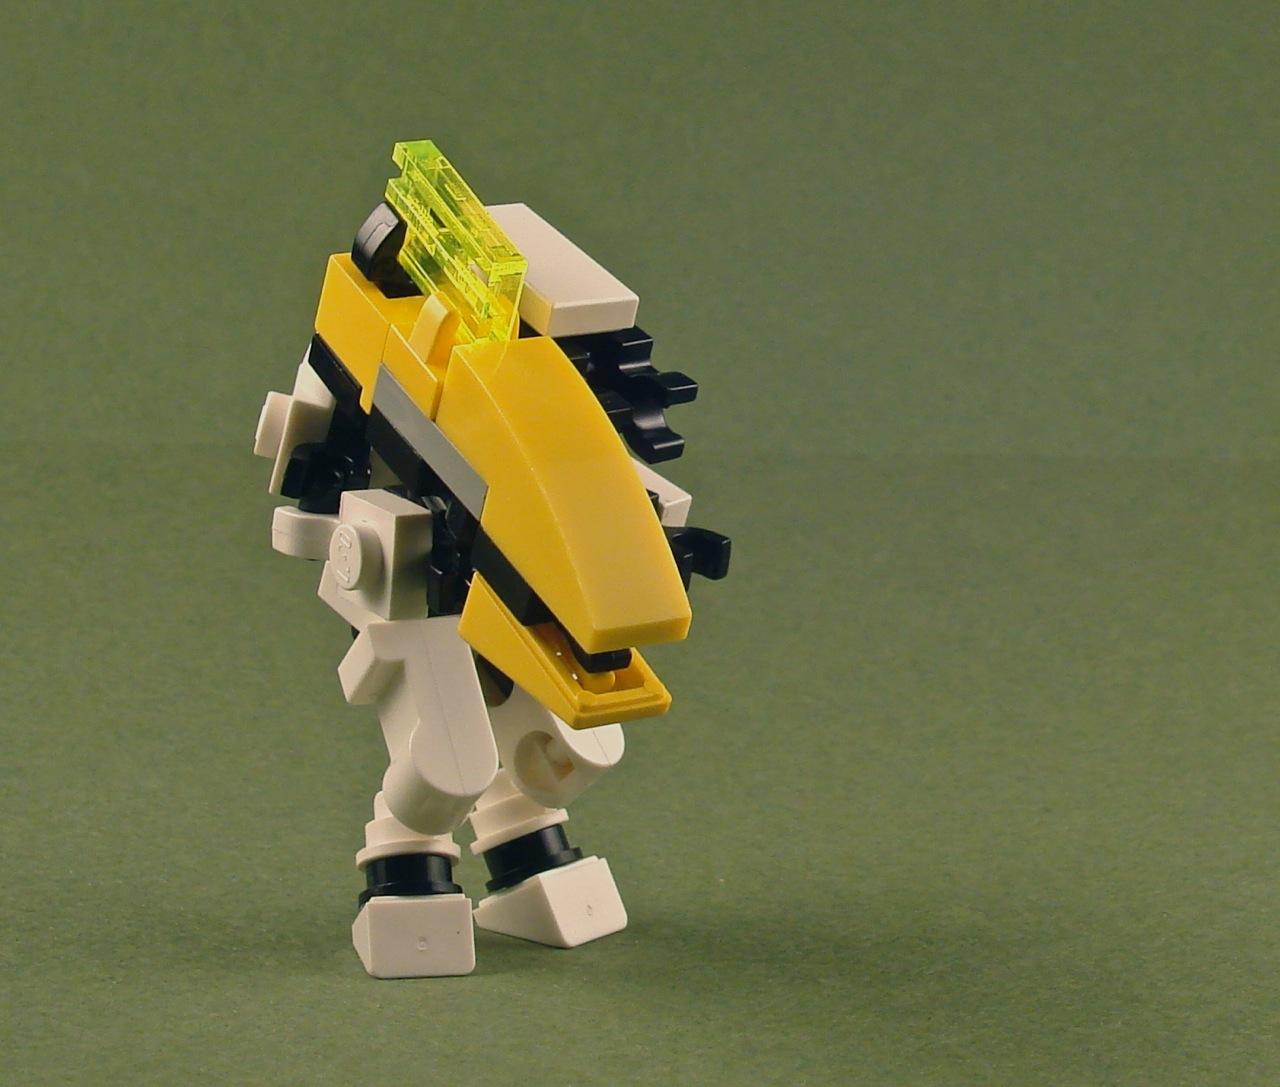 Wallpaper : LEGO, anniversary, Halo, Elite, reach, combat